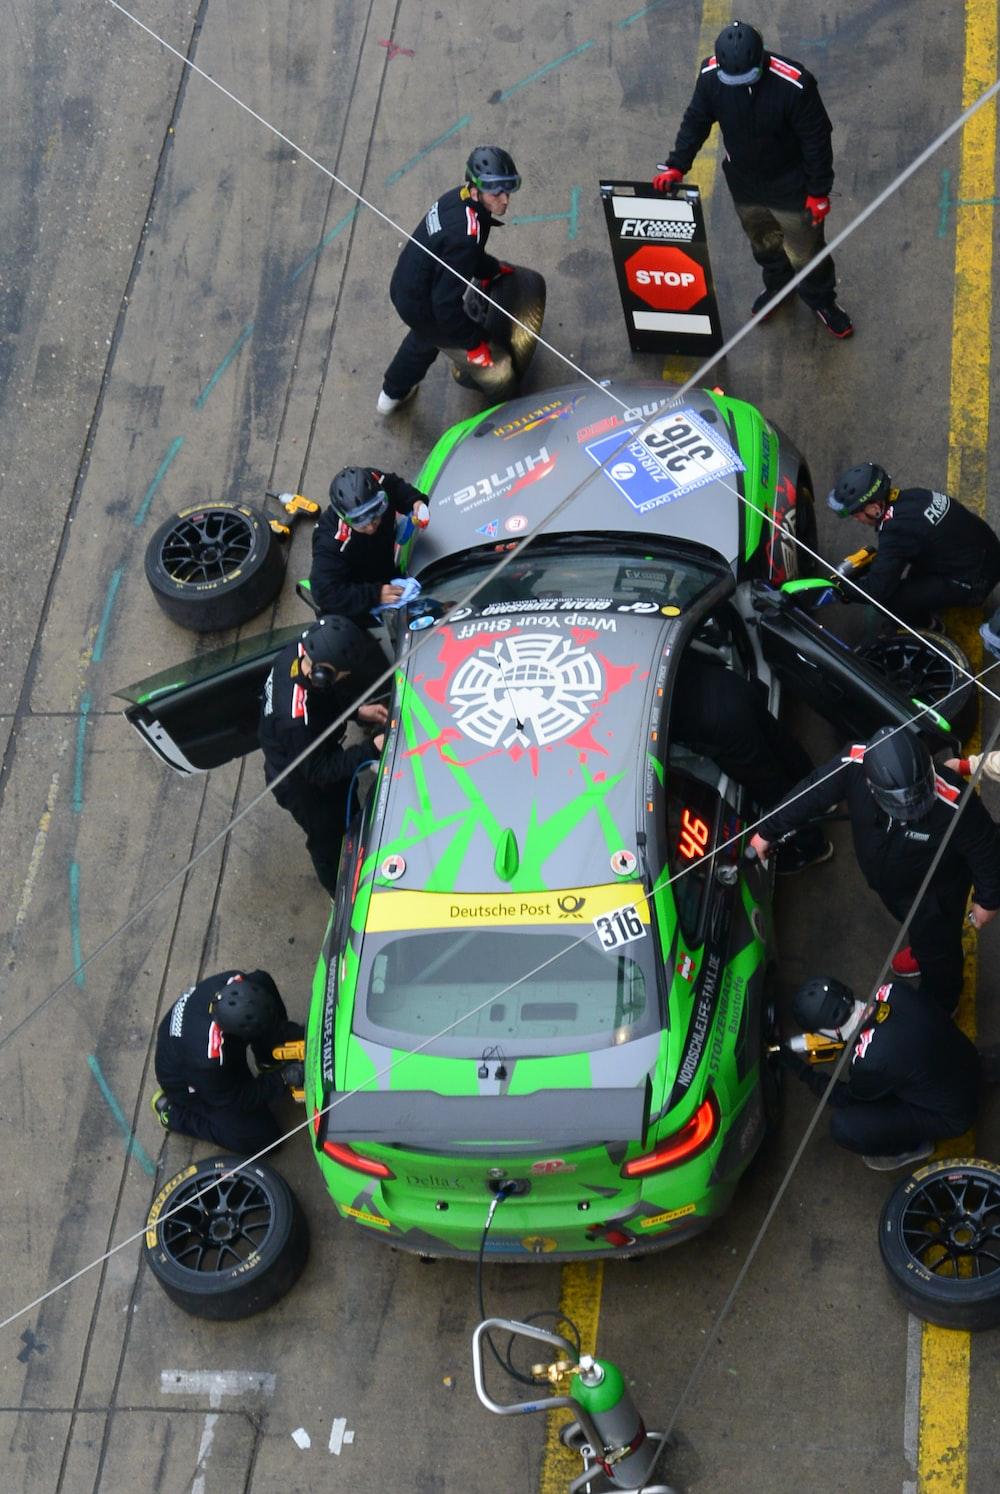 green and black racing car